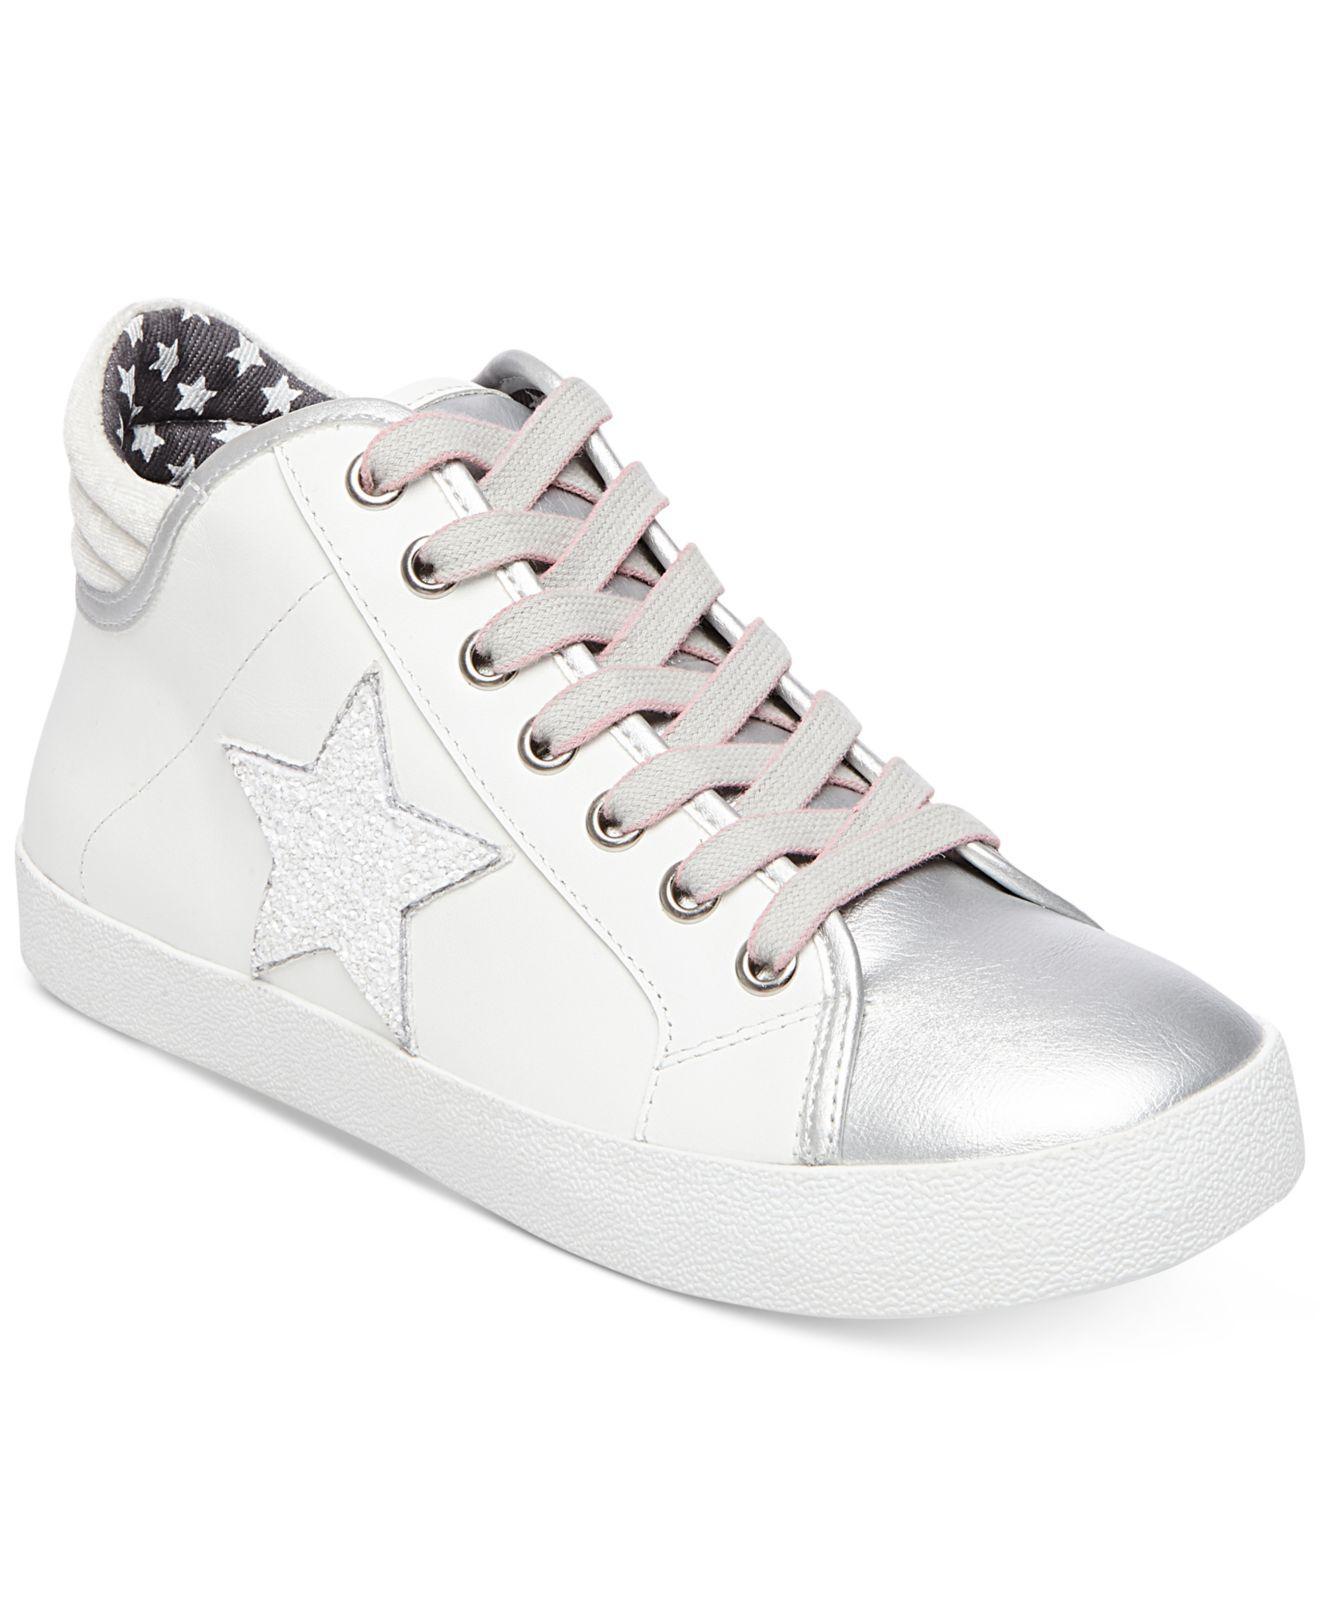 3d54e0a532e Lyst - Steve Madden Women s Savior Star Sneakers in White